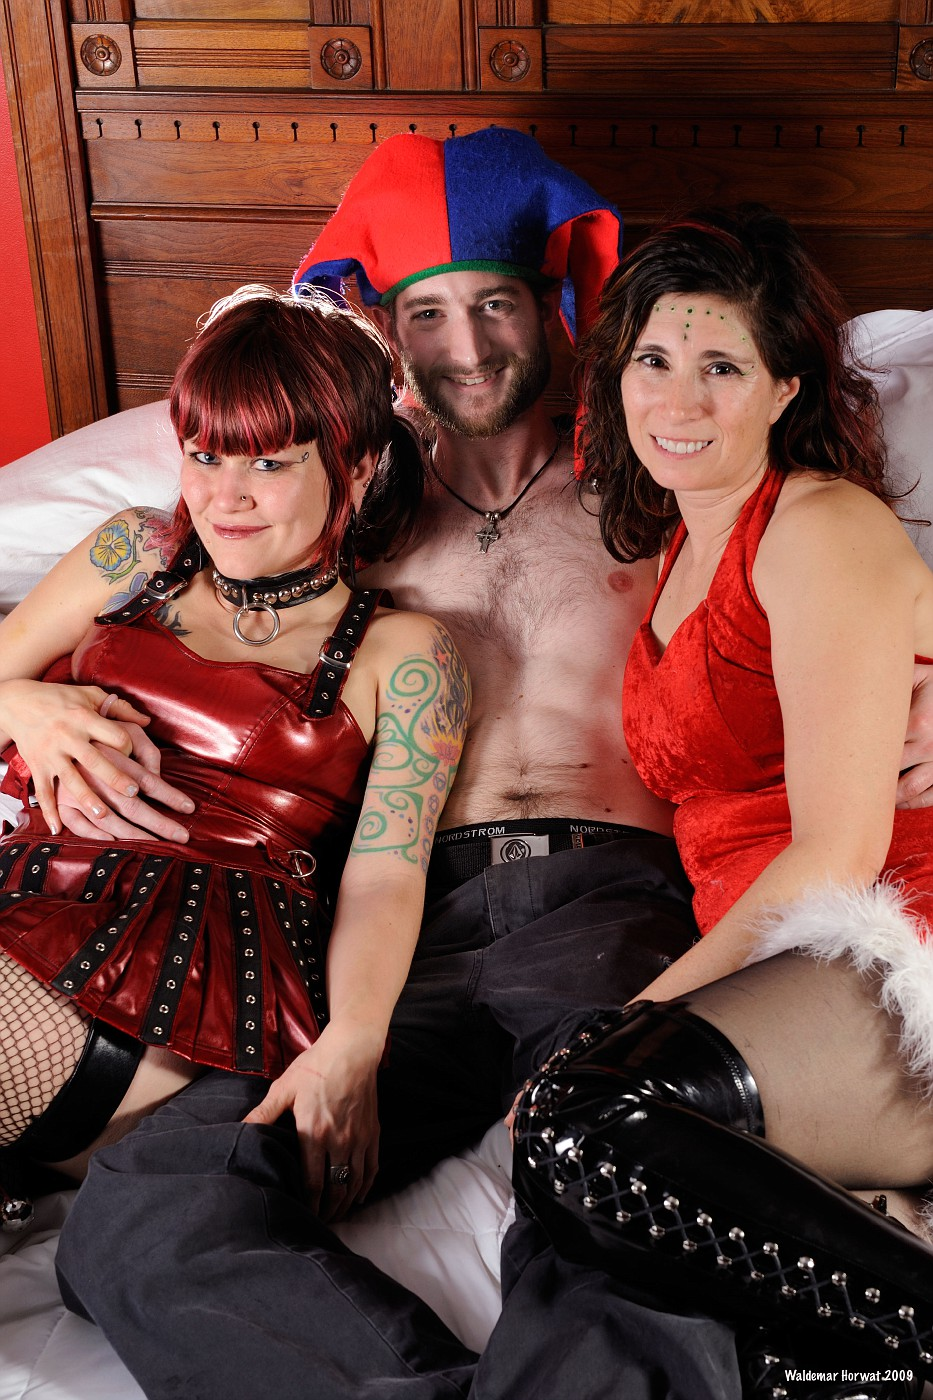 Melody, Brian, and Melanie